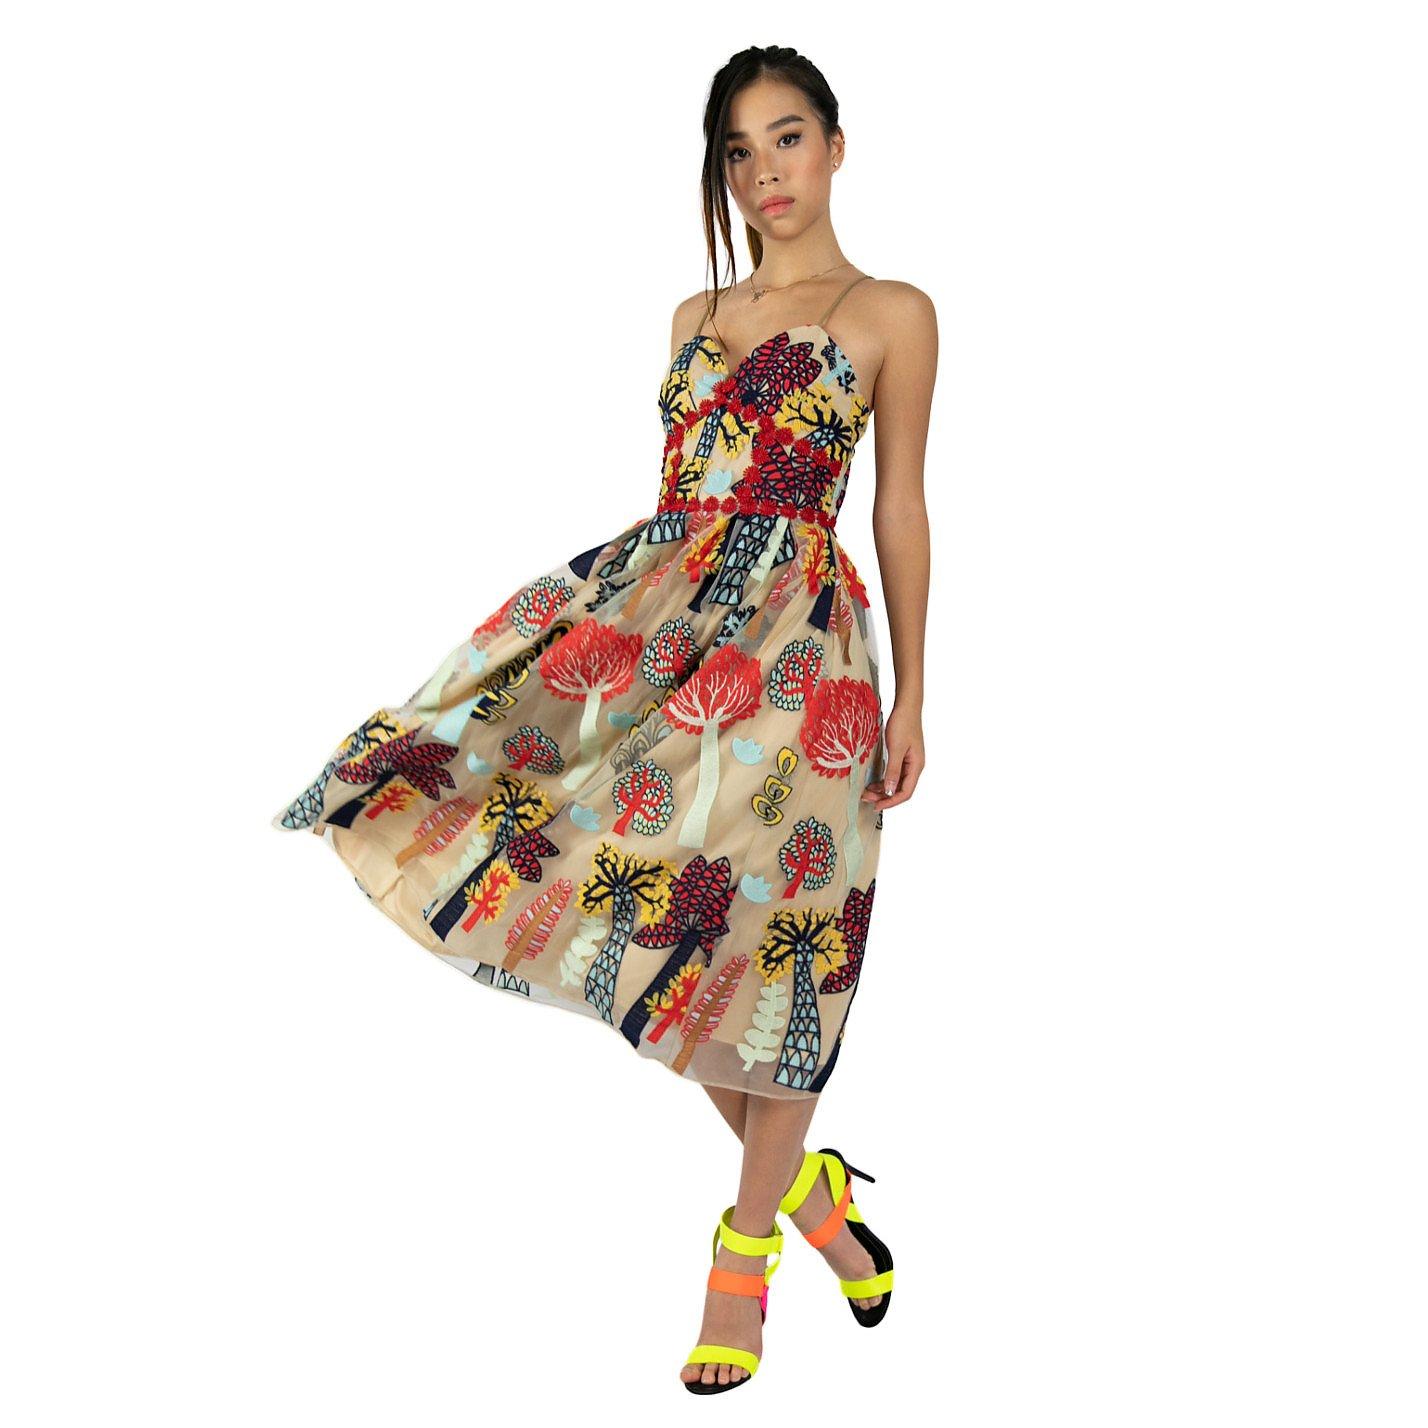 Syra J Fancy Lace Spaghetti Strap Dress